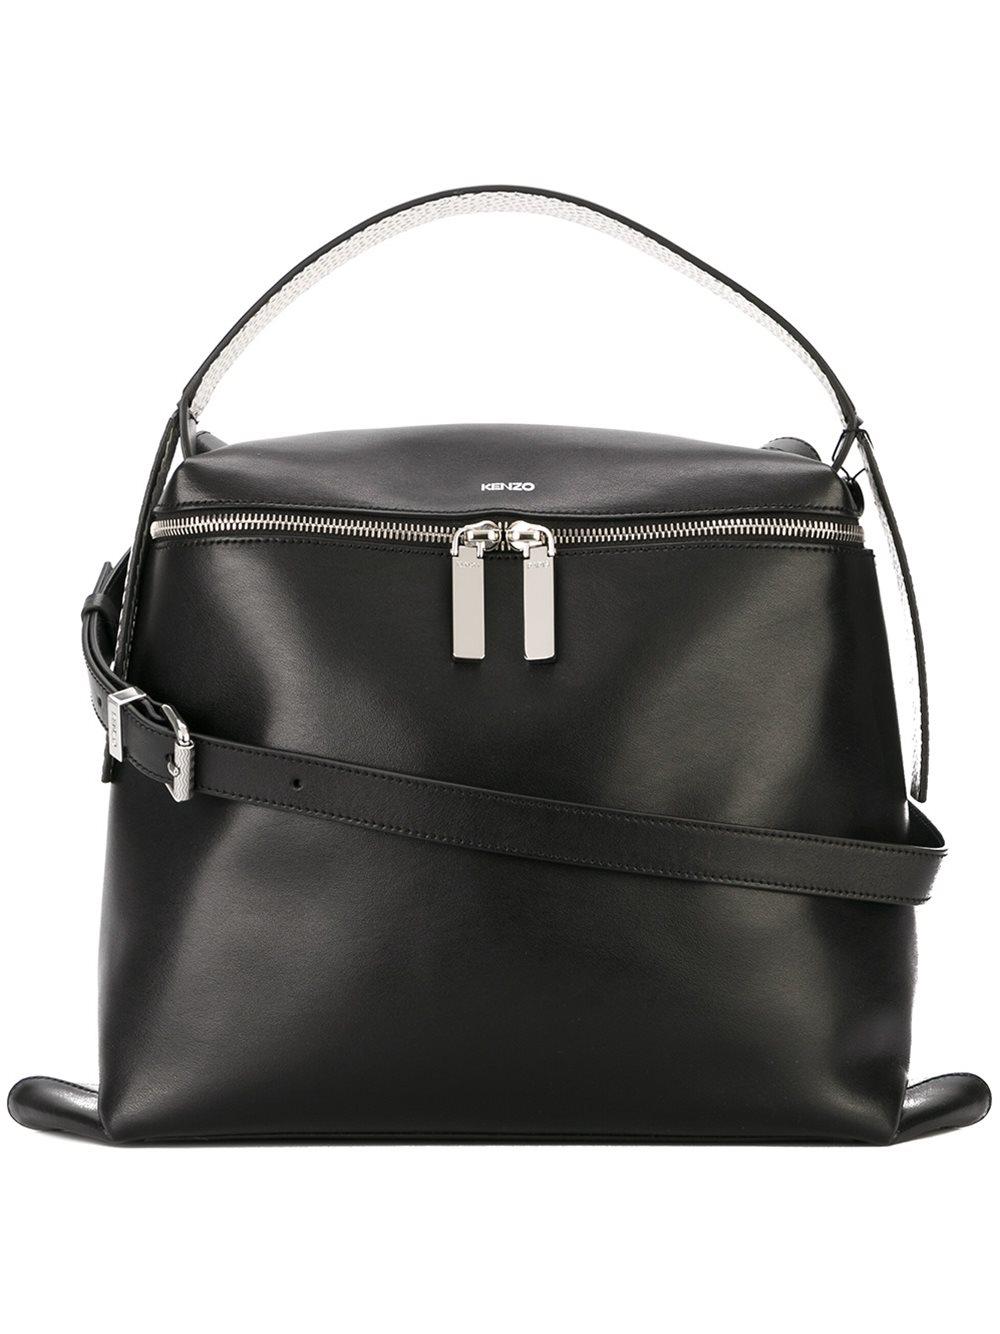 ad26f90ec530 Kenzo sac à main